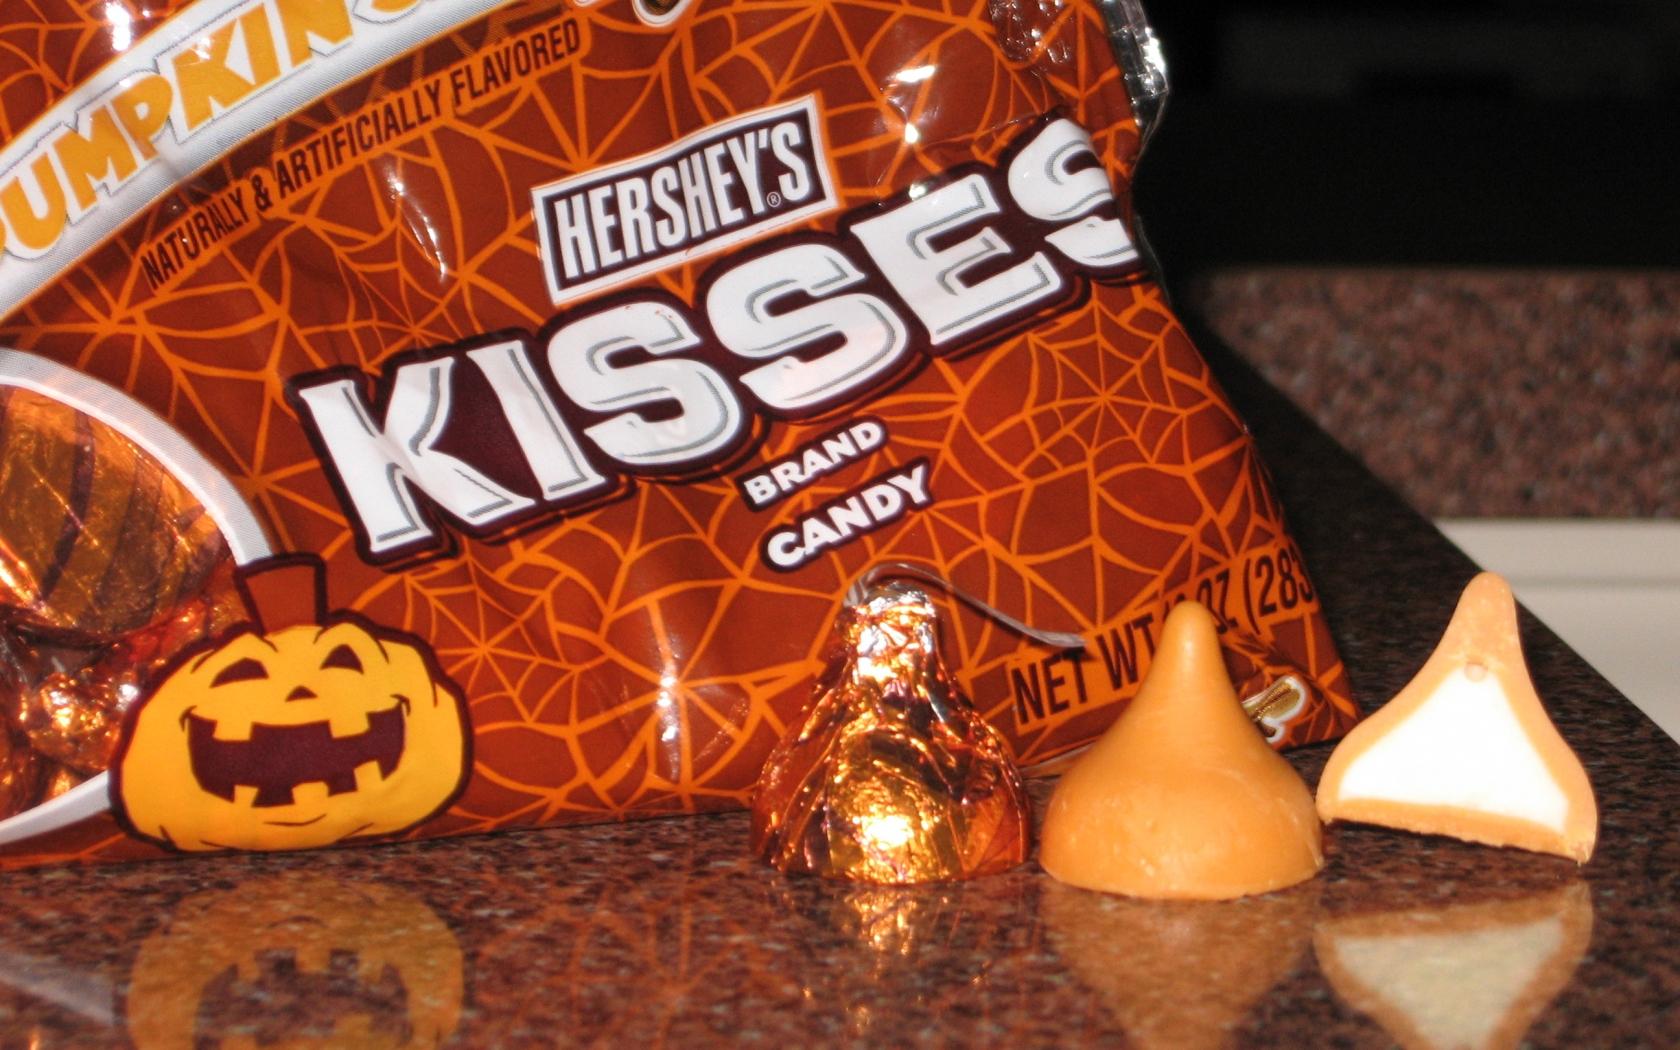 download Hershey Kisses Wallpaper Spice hershey kisses 1680x1050